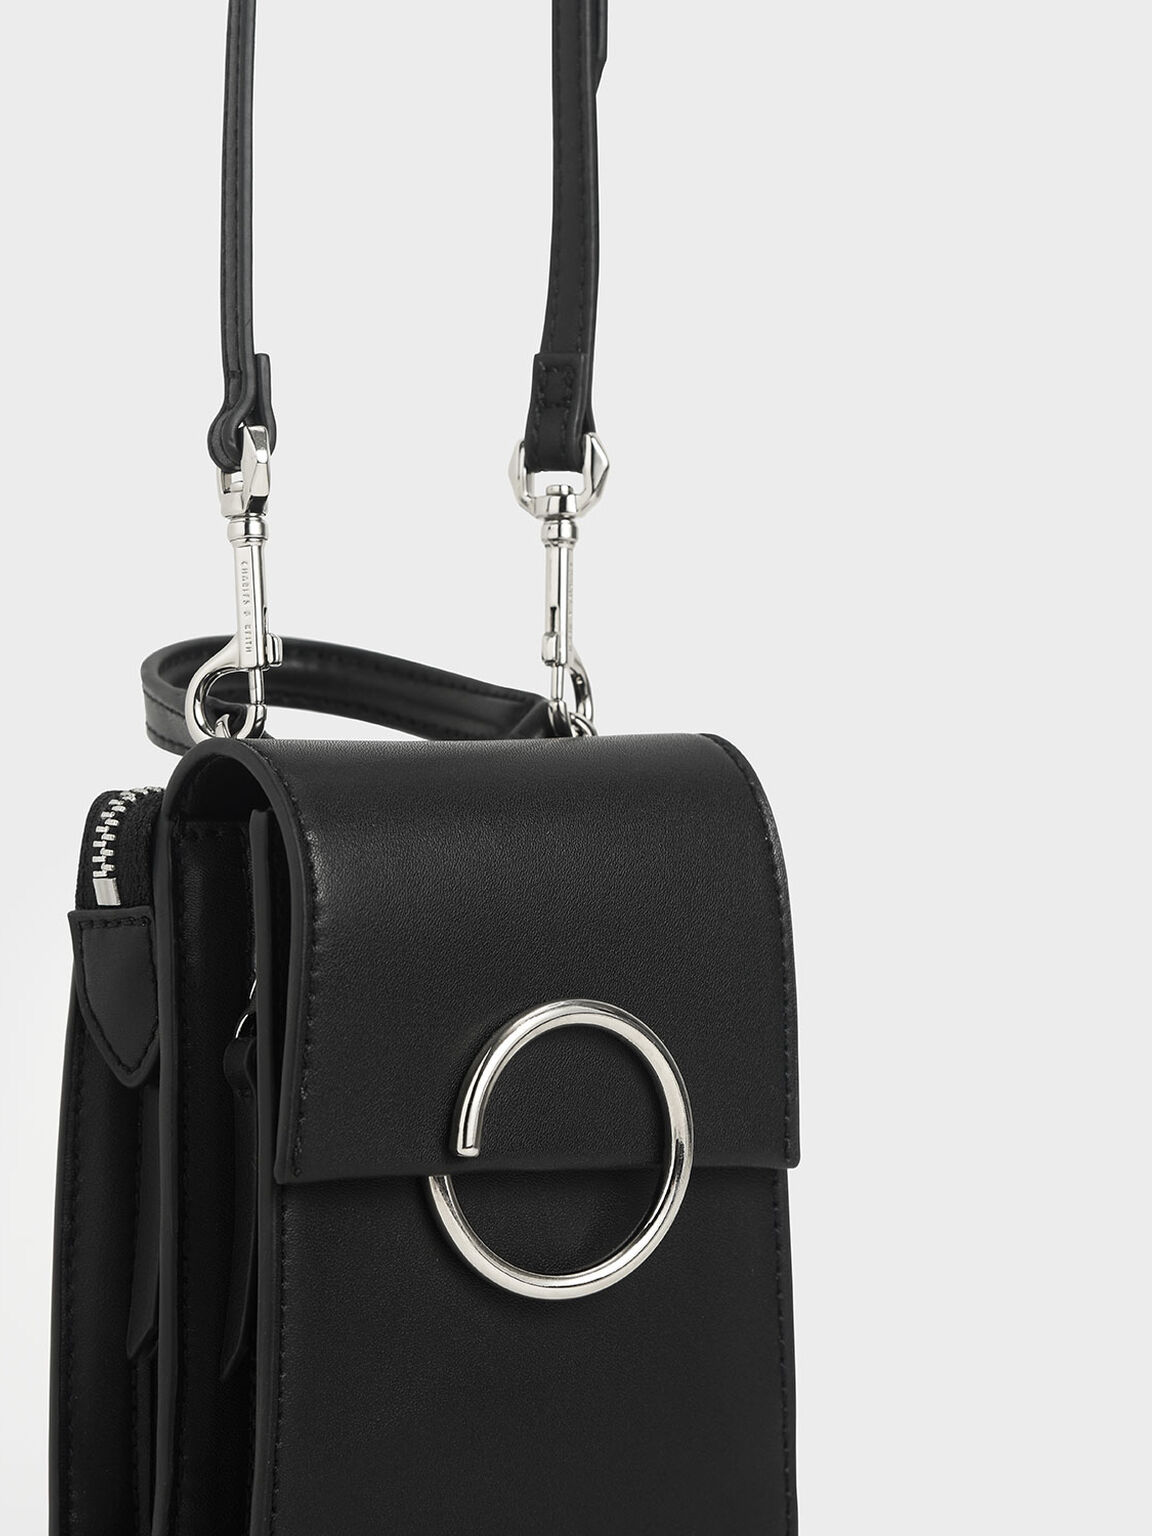 Ring Detail Elongated Bag, Black, hi-res